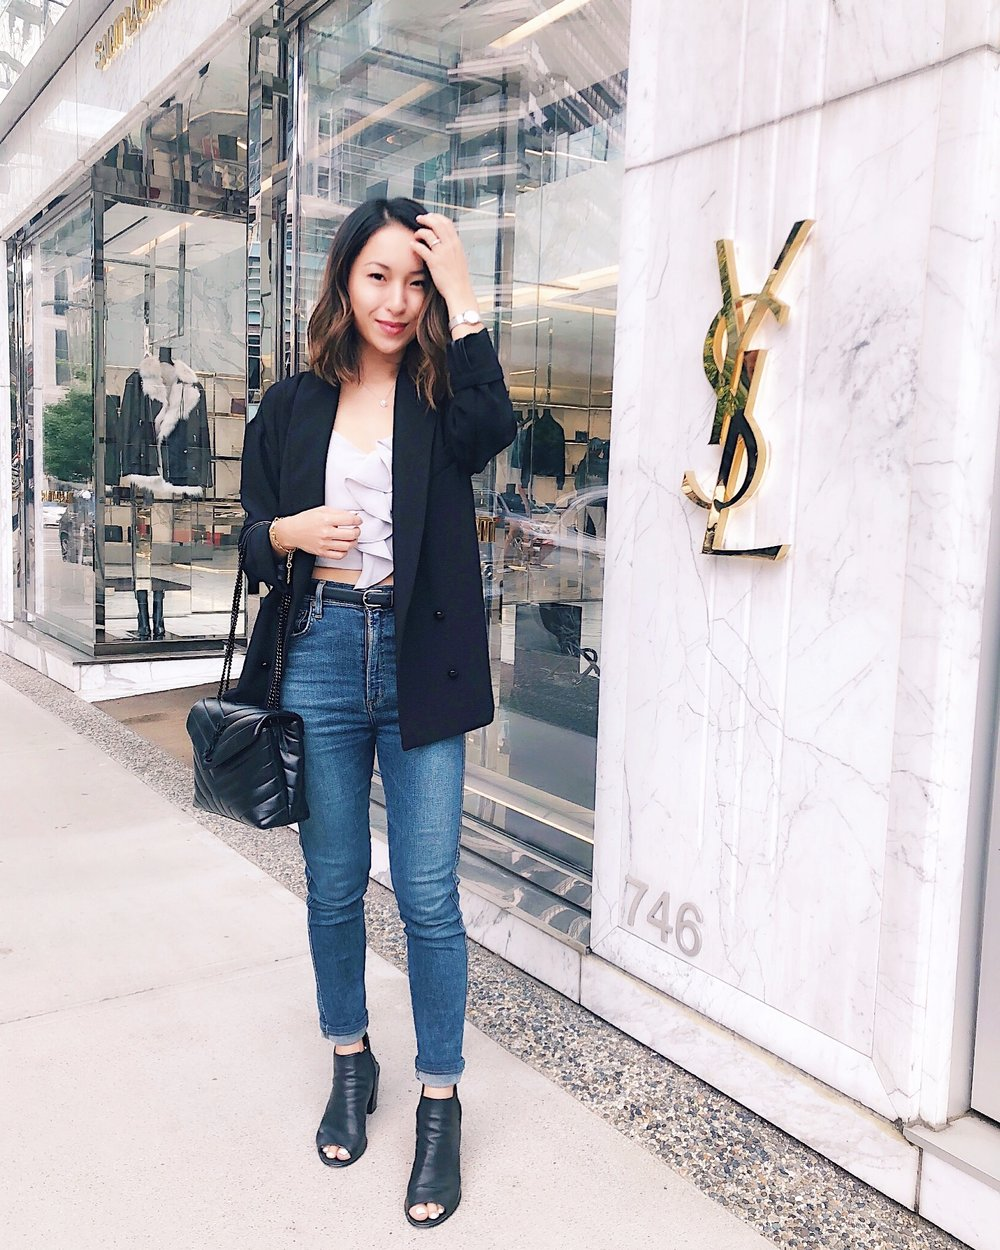 chic in the city - Blazer:Sessùn Jeans: AgoldeBag: Saint LaurentShoes: Steve Madden